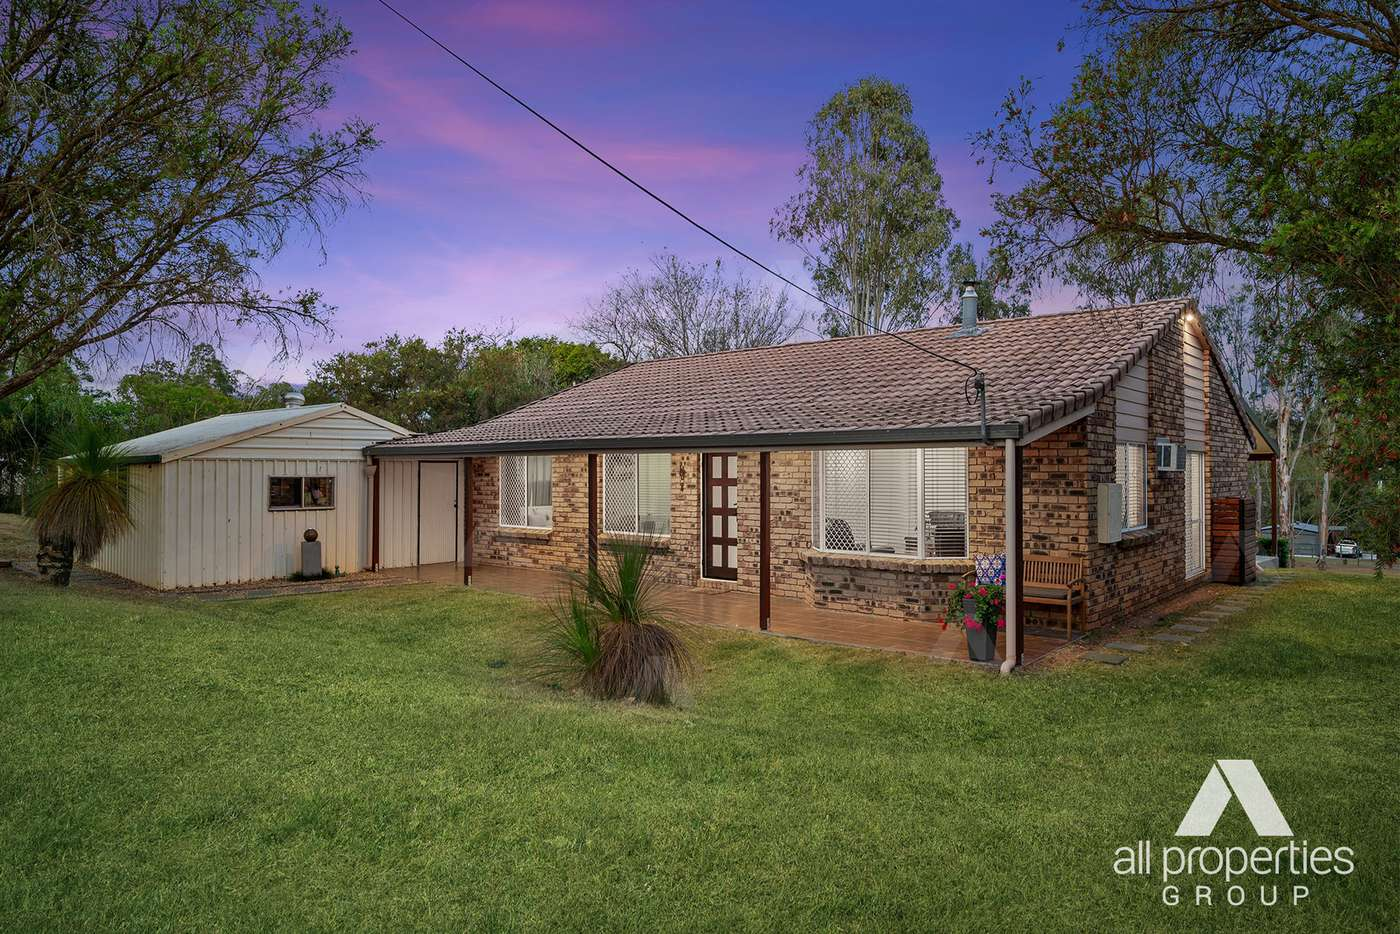 Main view of Homely house listing, 259 Cedar Grove Road, Cedar Grove QLD 4285